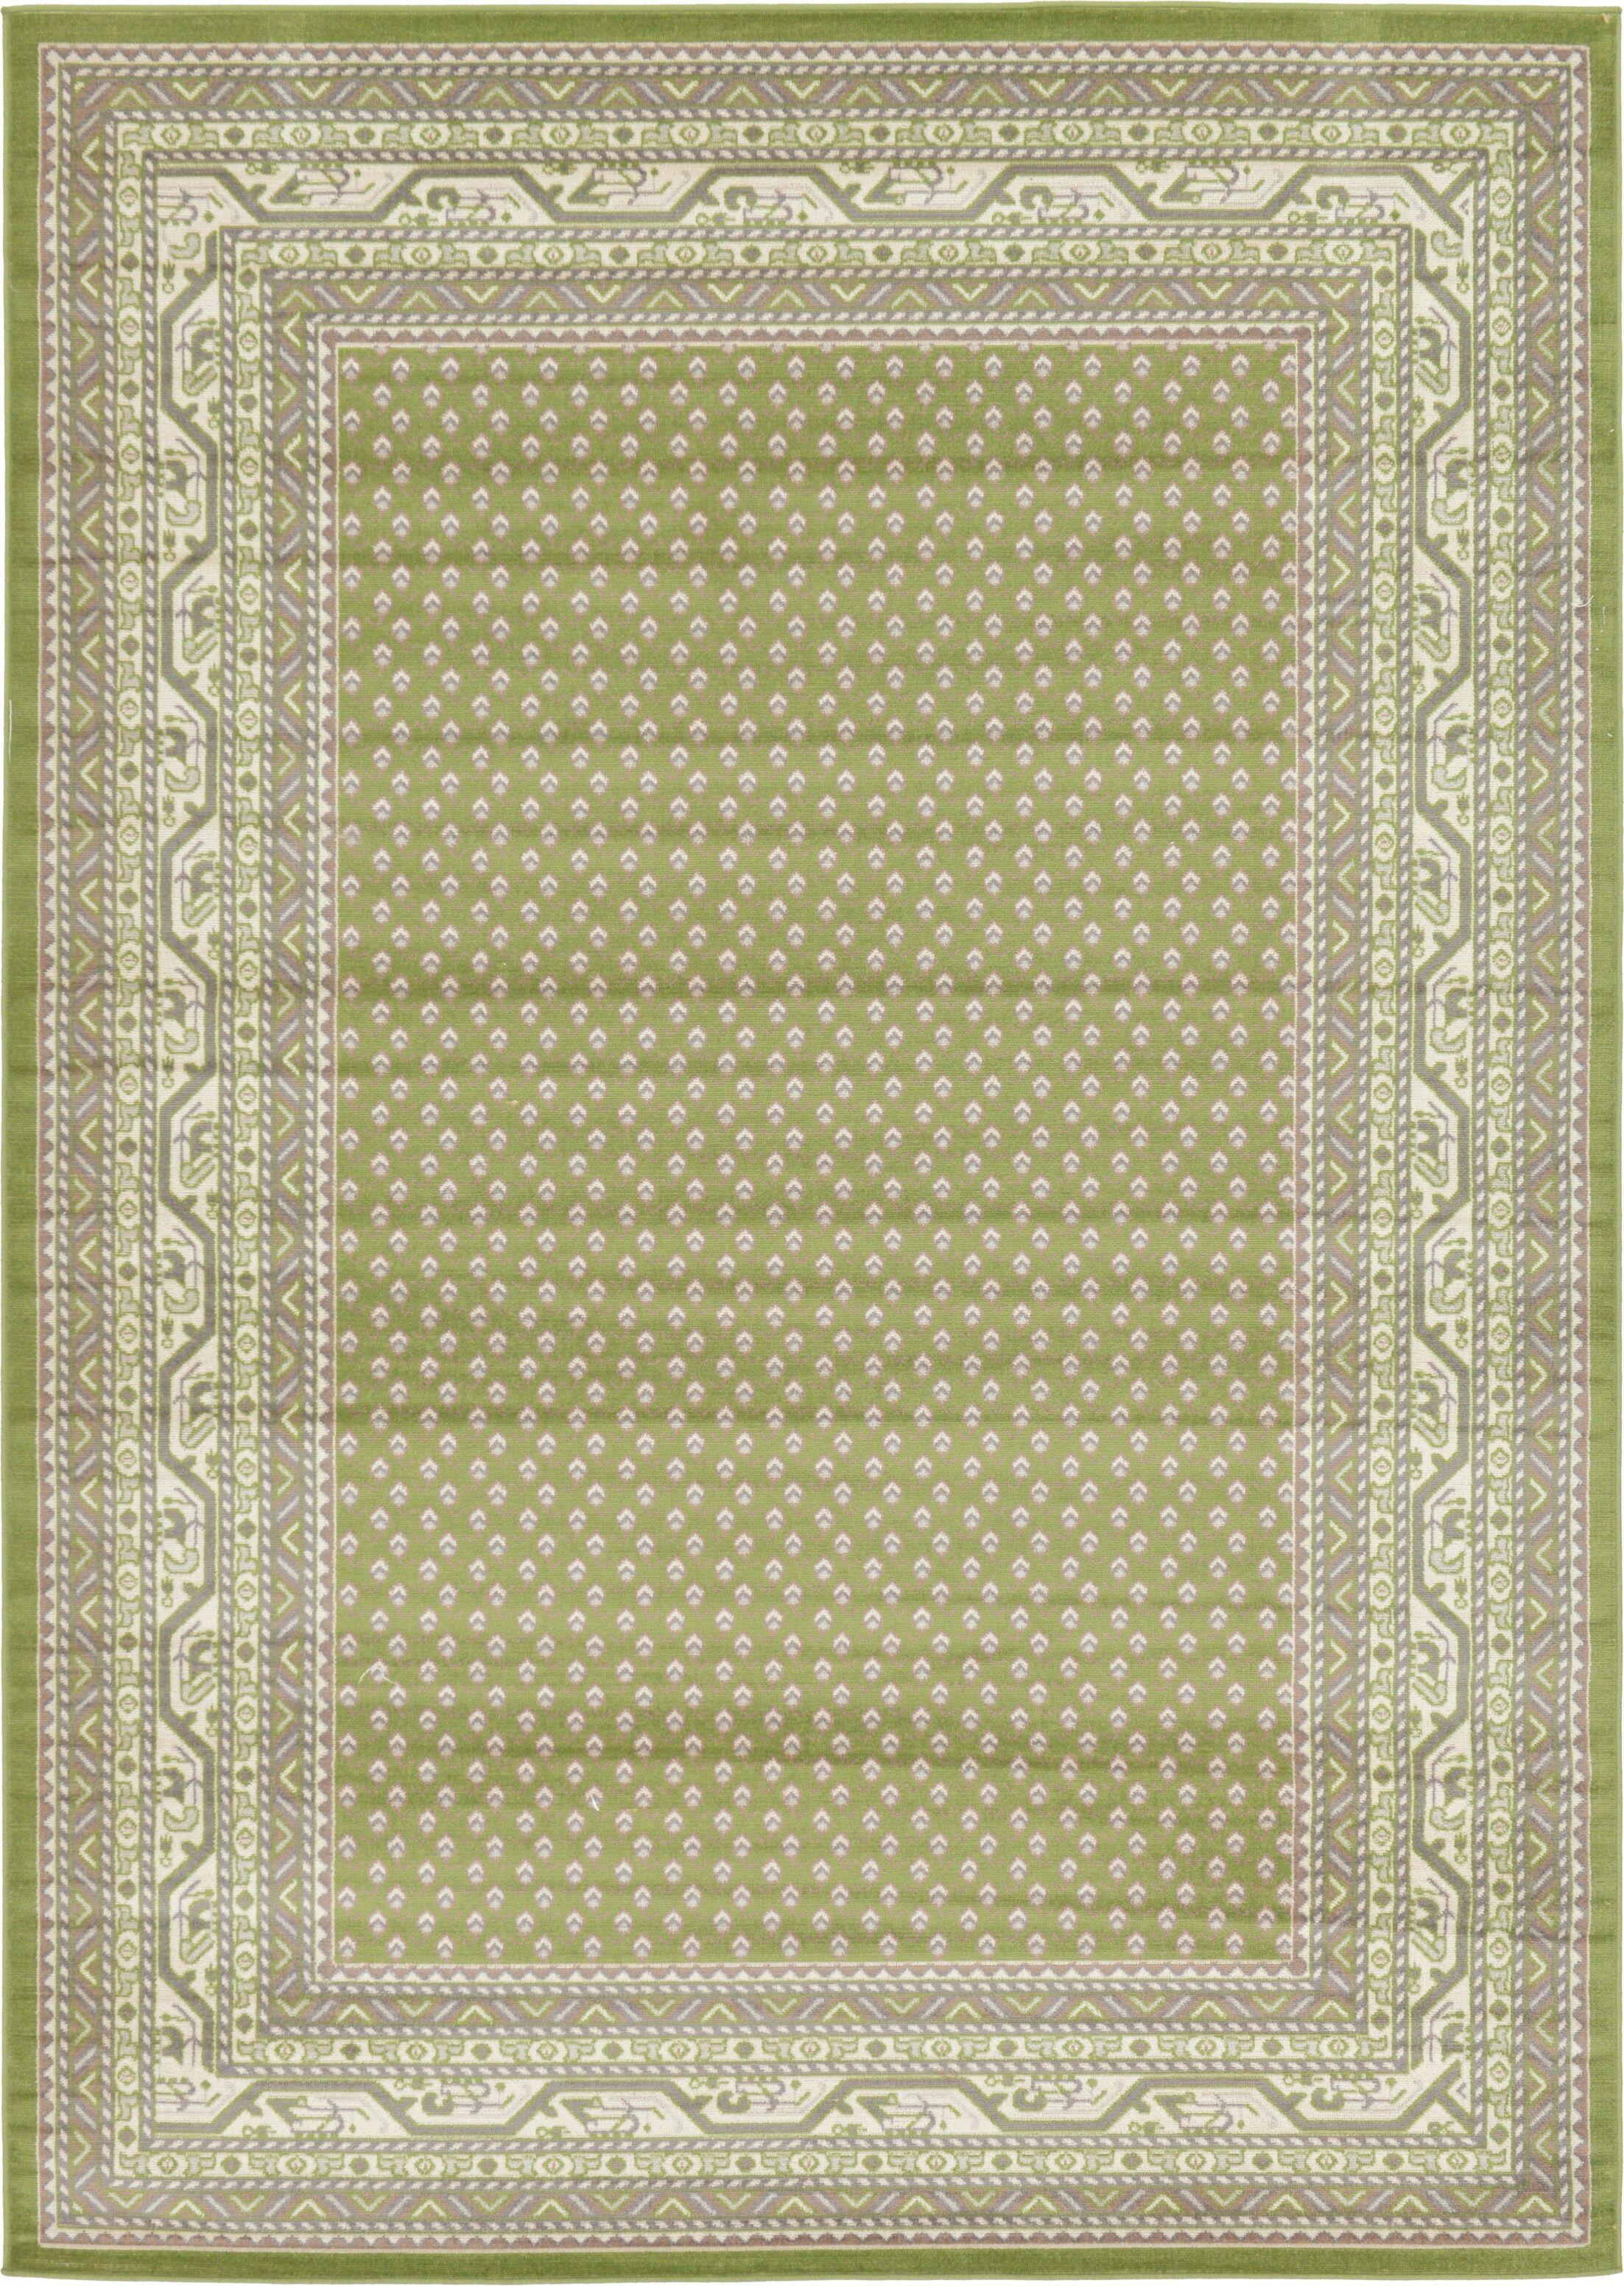 Gillam Geometric Green Area Rug Rug Size: Rectangle 7' x 10'